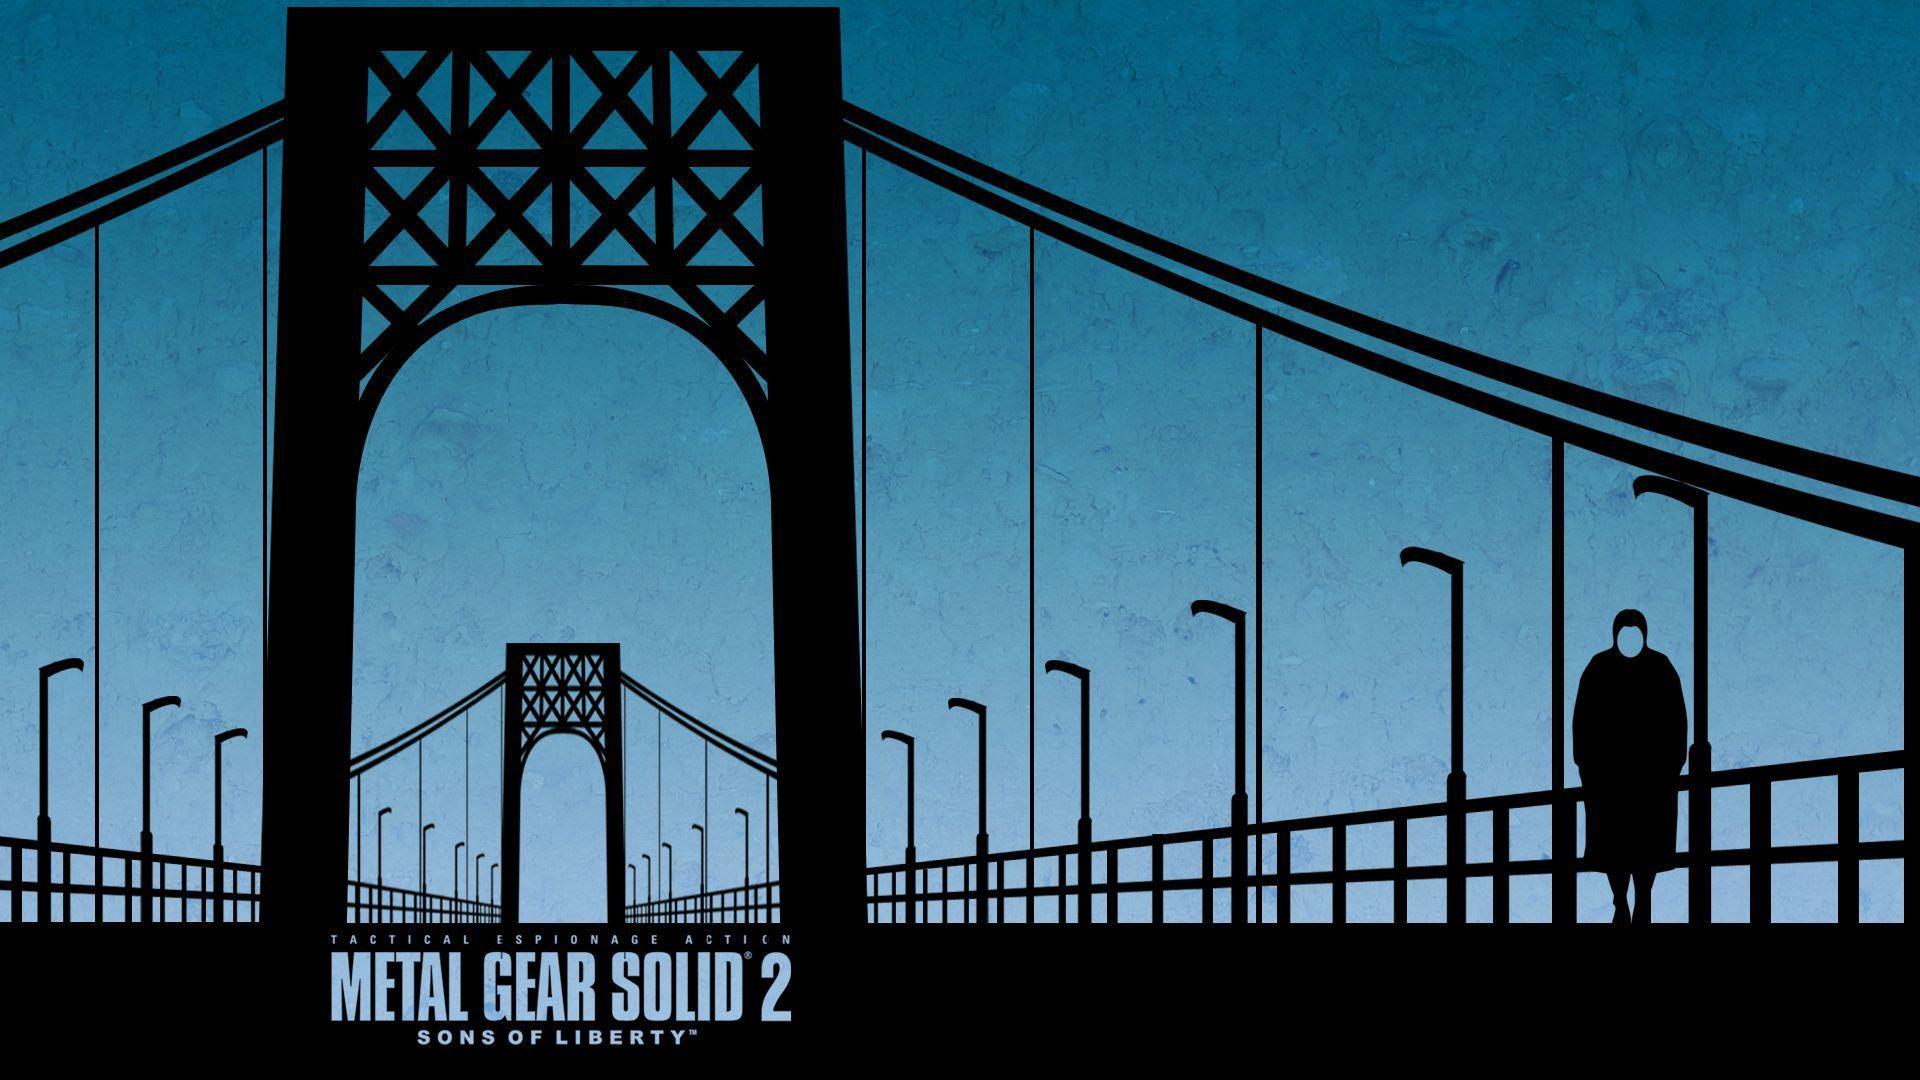 Metal Gear Solid 2 Wallpaper (74+ images)